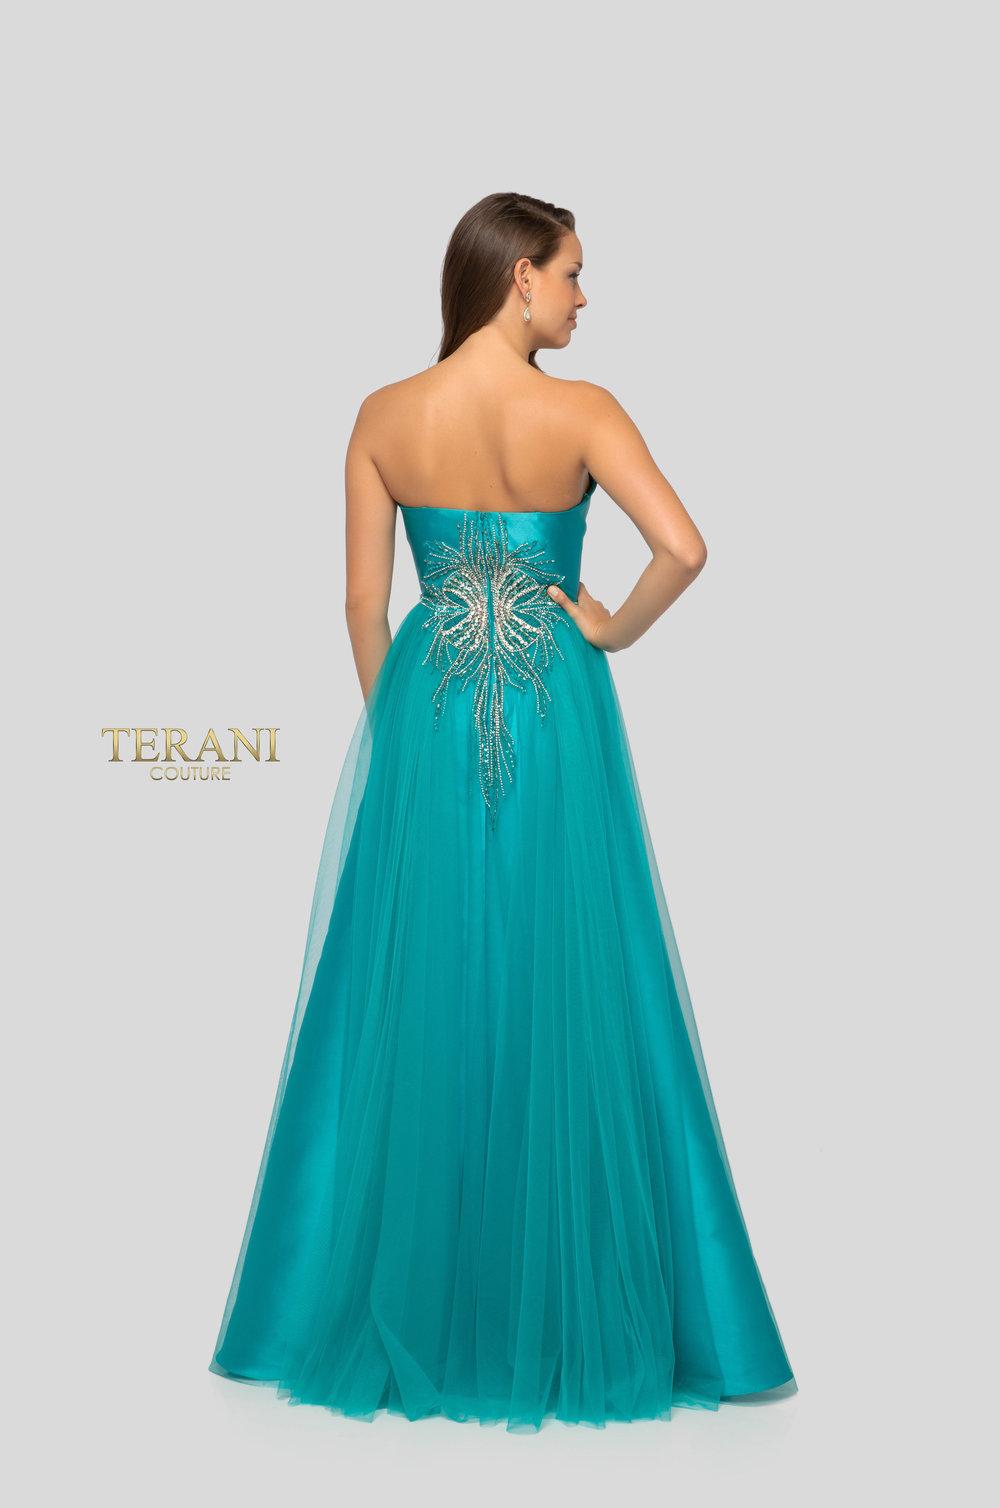 Terani Couture Style 1912P8211